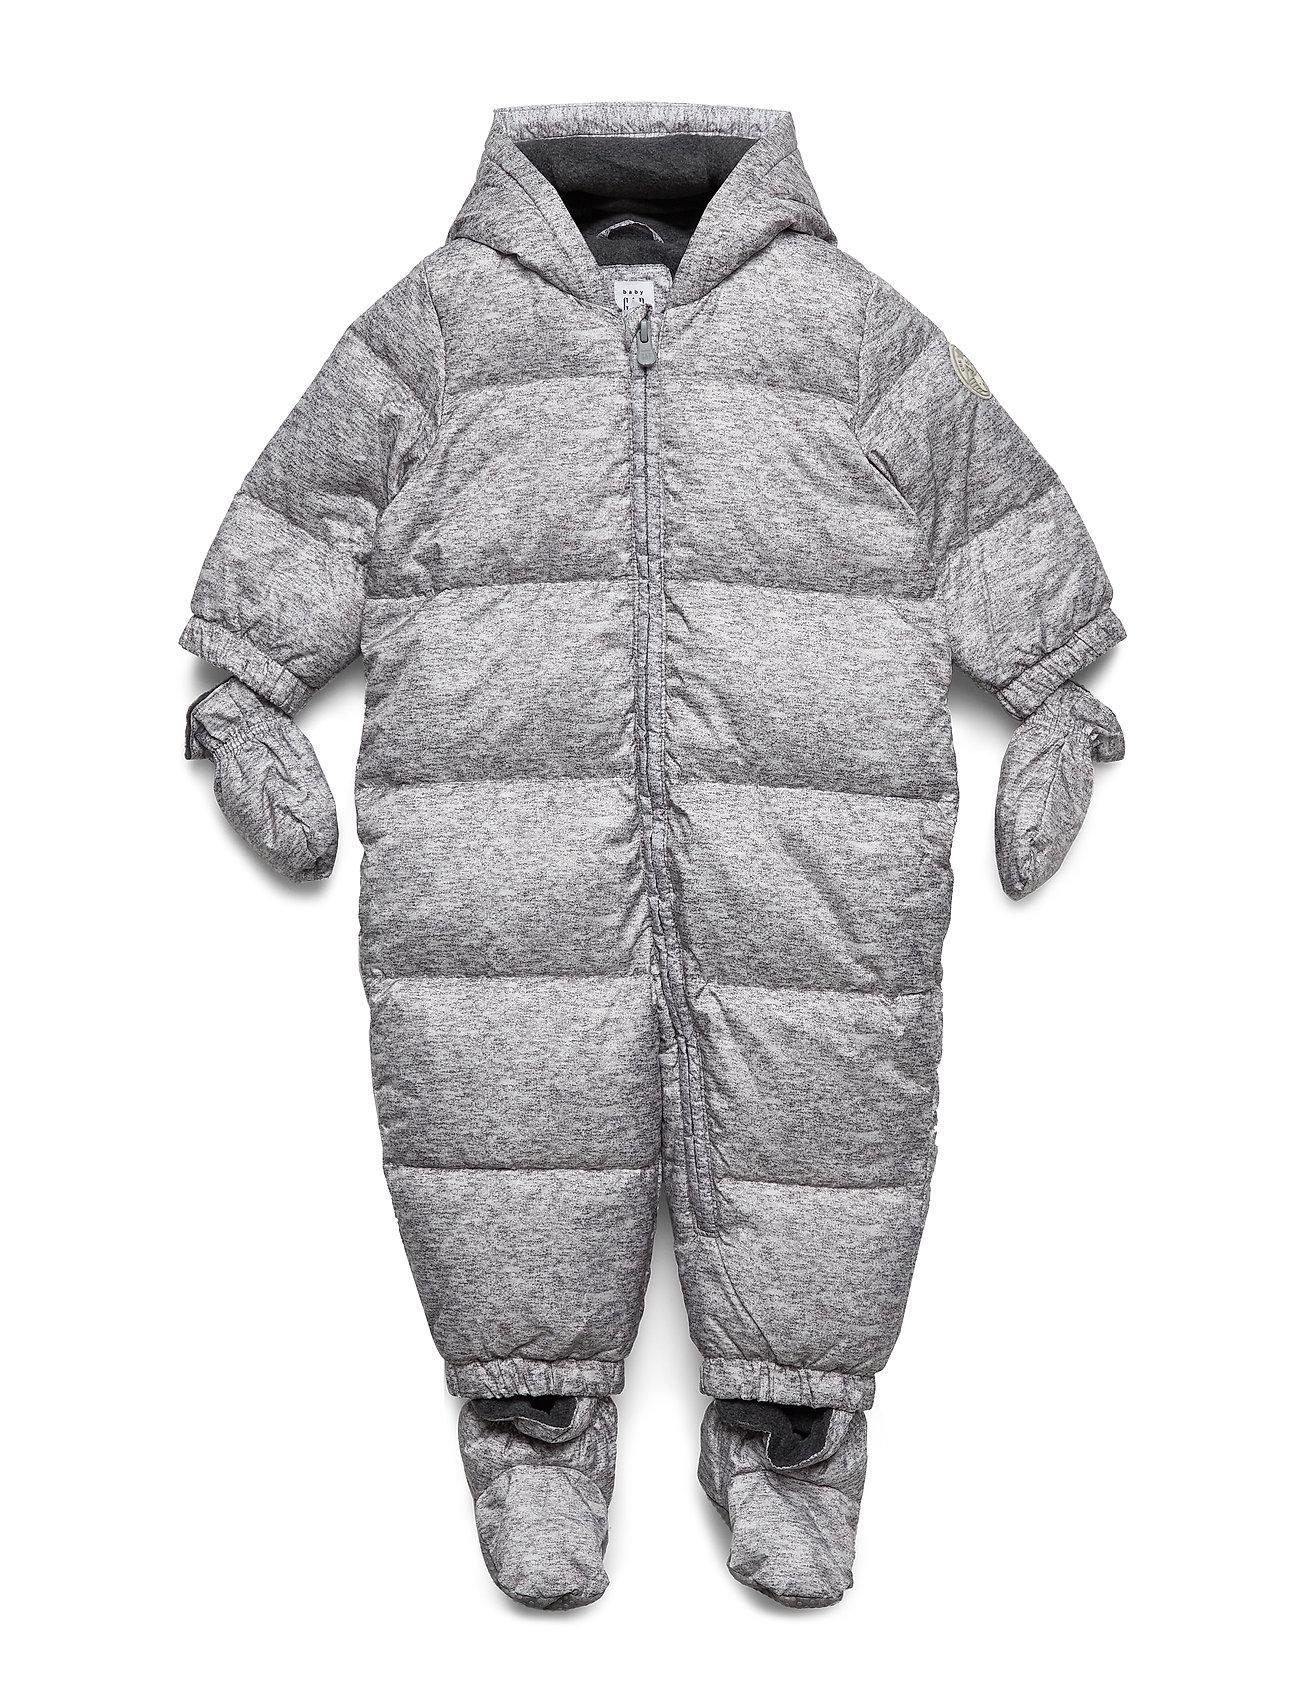 GAP Baby ColdControl Ultra Max Down Snowsuit - FLINT GREY